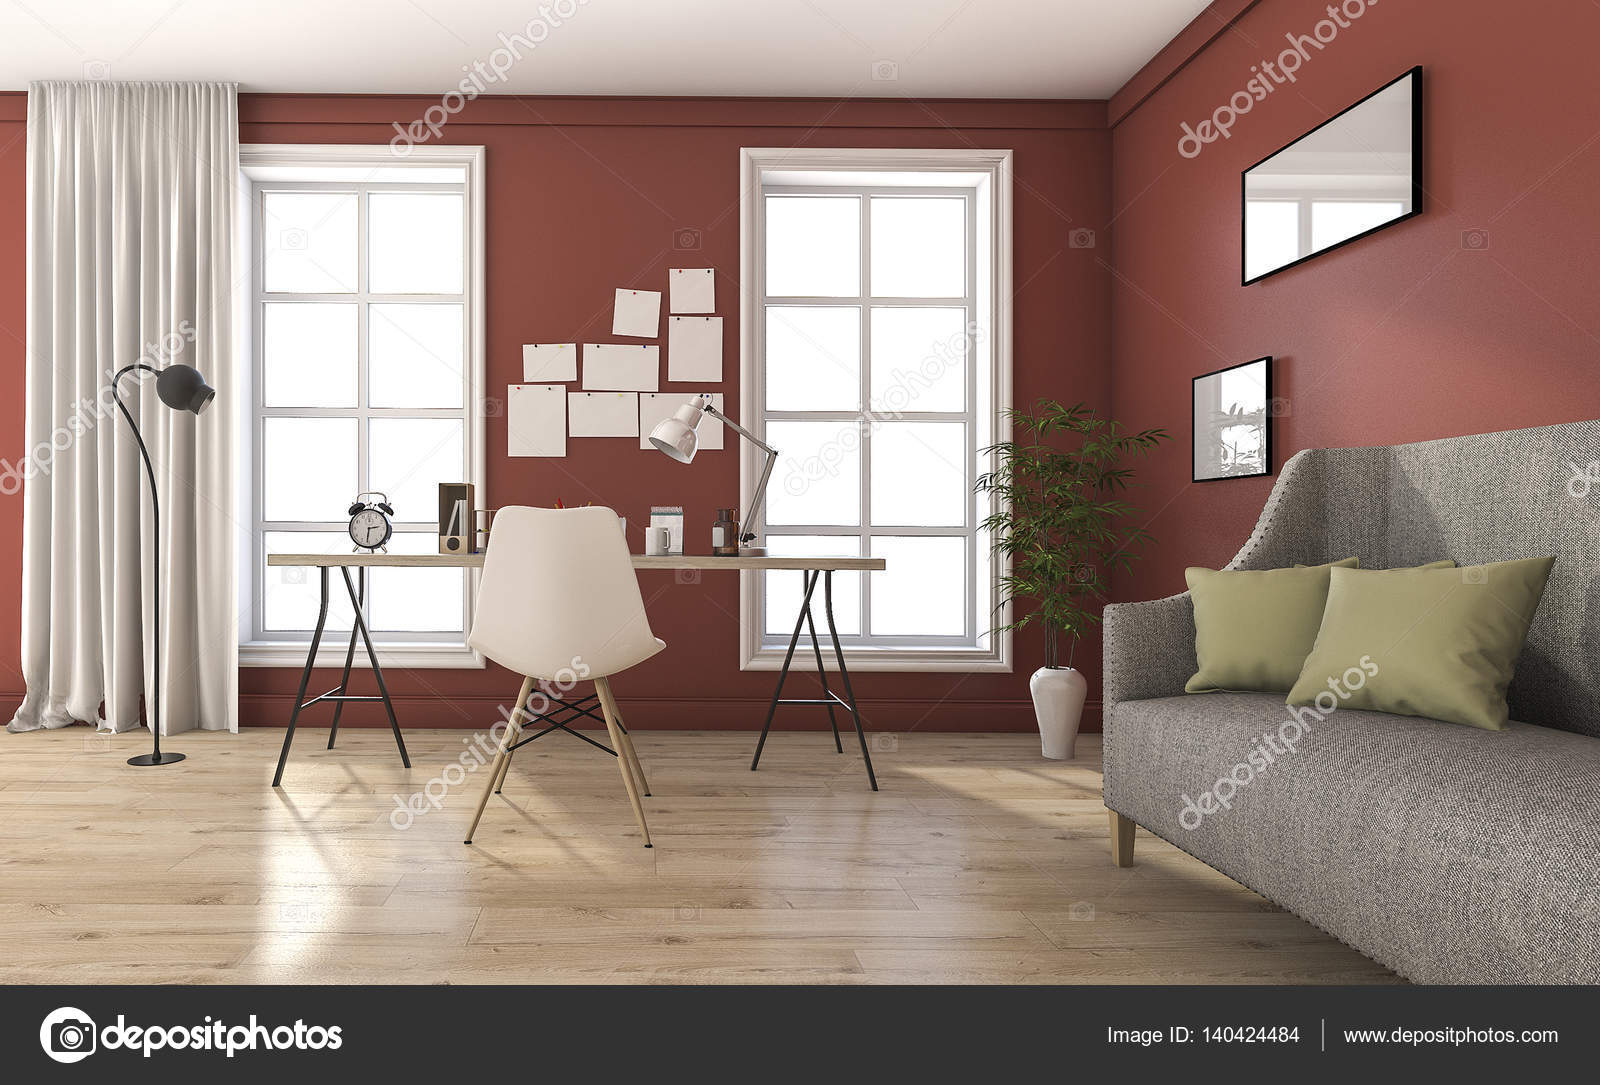 Vintage Woonkamer Meubels : 3d rendering rode vintage woonkamer met mooie meubels u2014 stockfoto